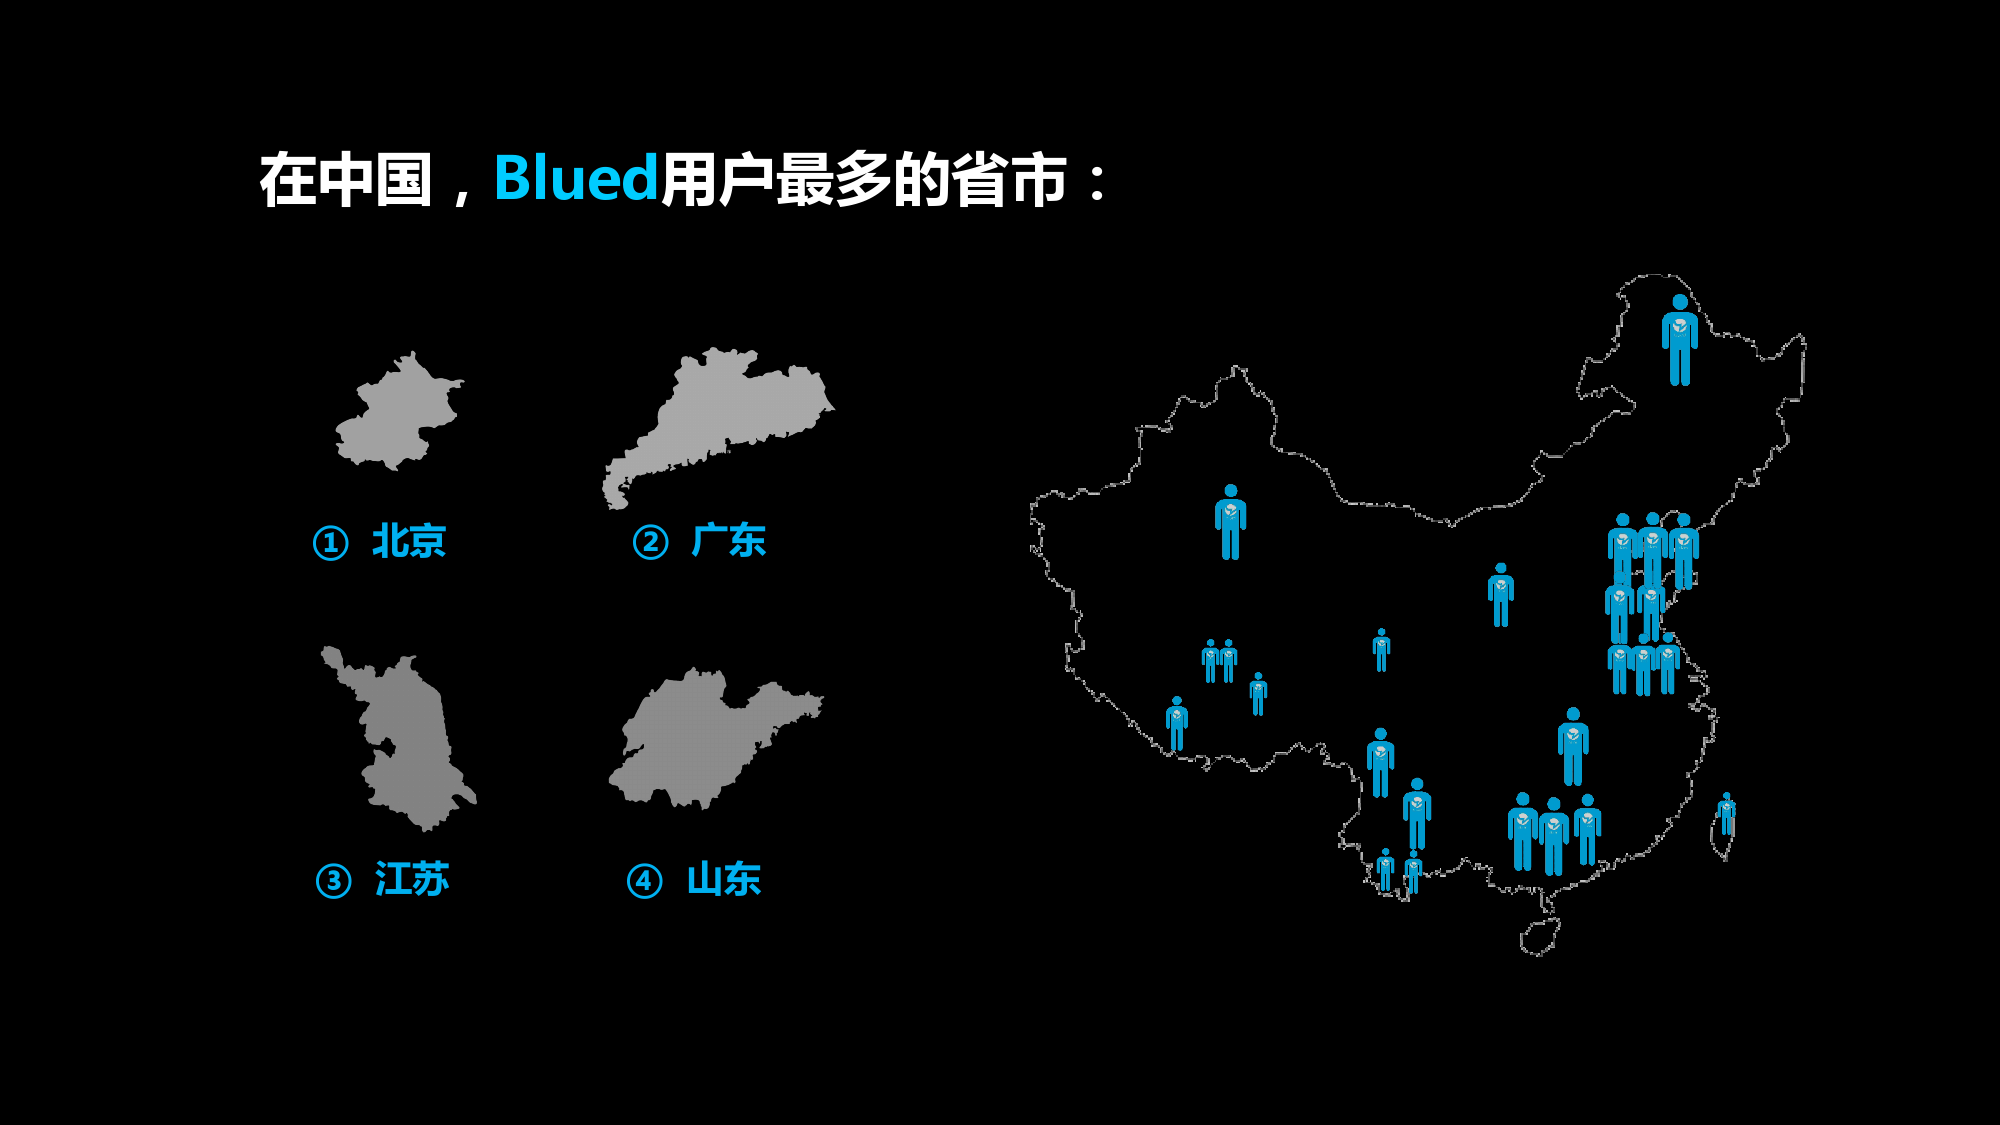 Blued2015中国同志社群大数据白皮书_000007